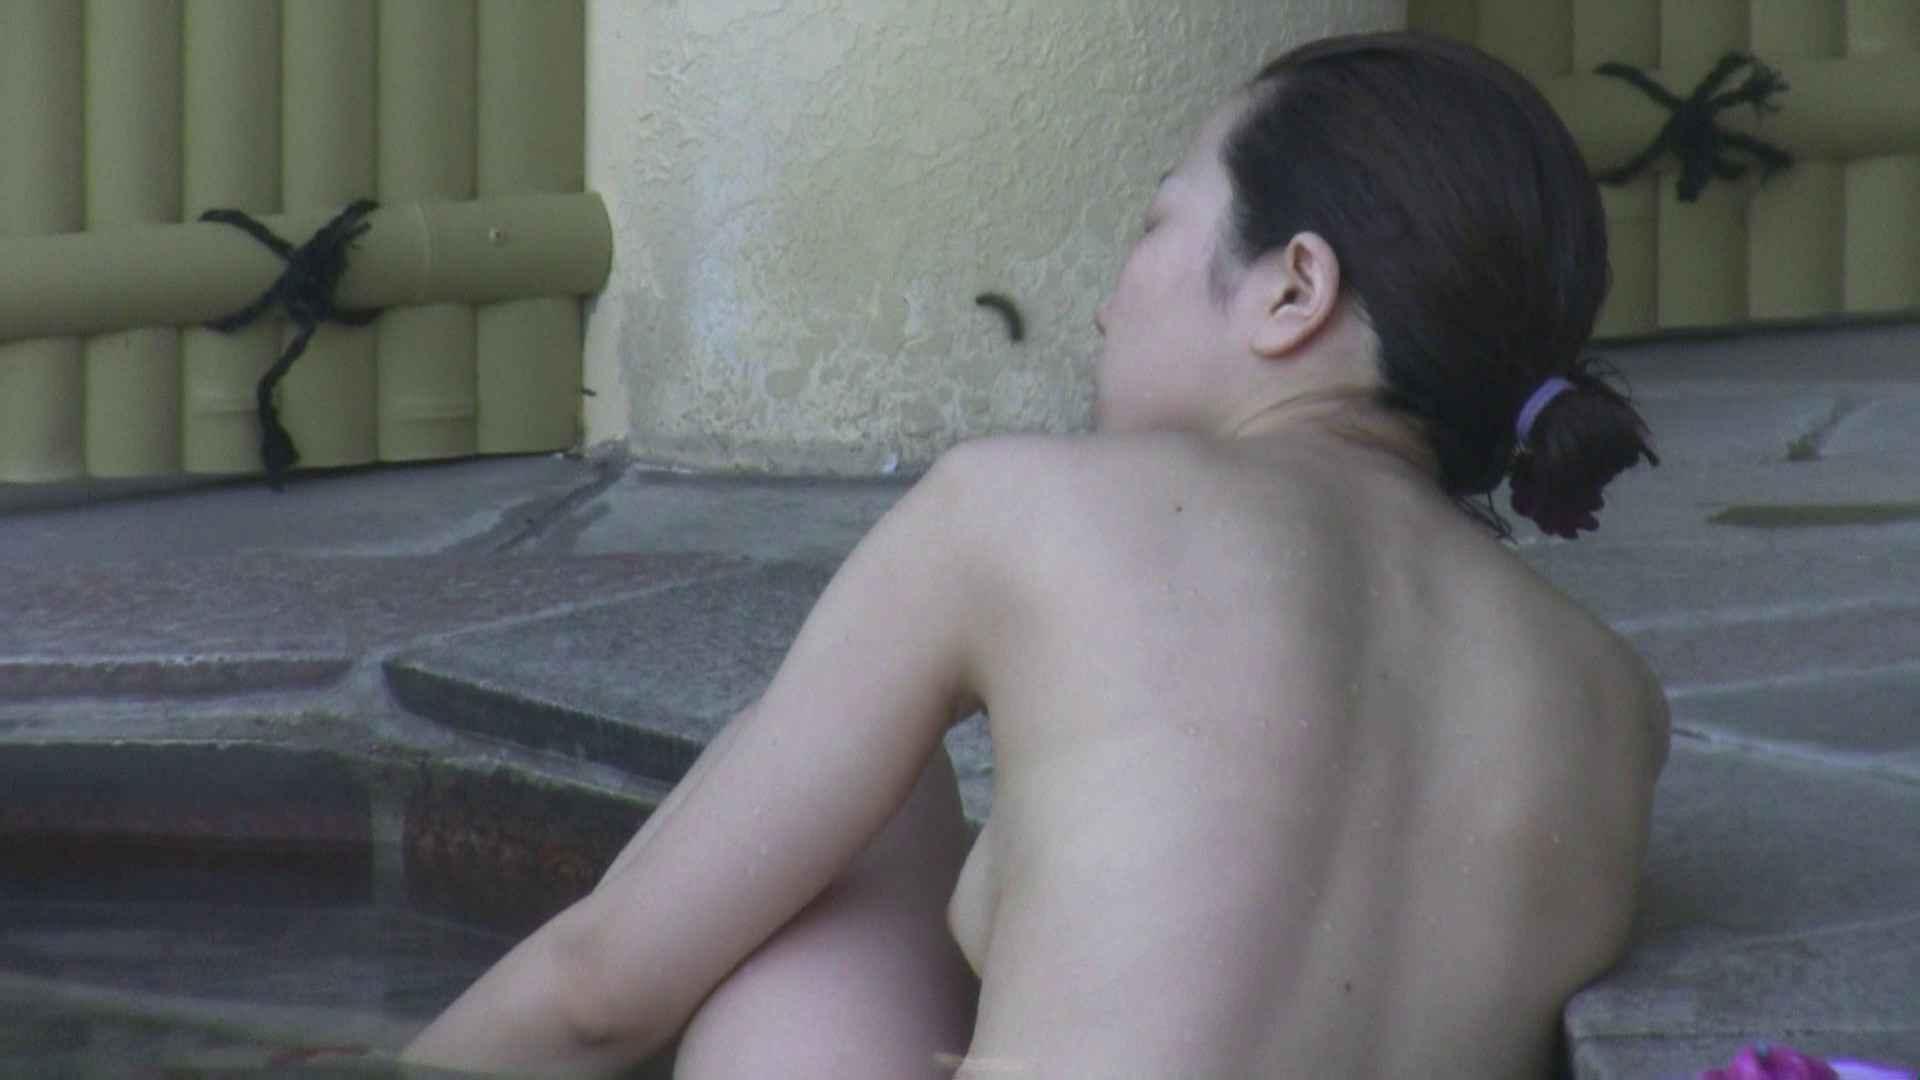 Aquaな露天風呂Vol.88【VIP限定】 綺麗なOLたち | 盗撮  57枚 49